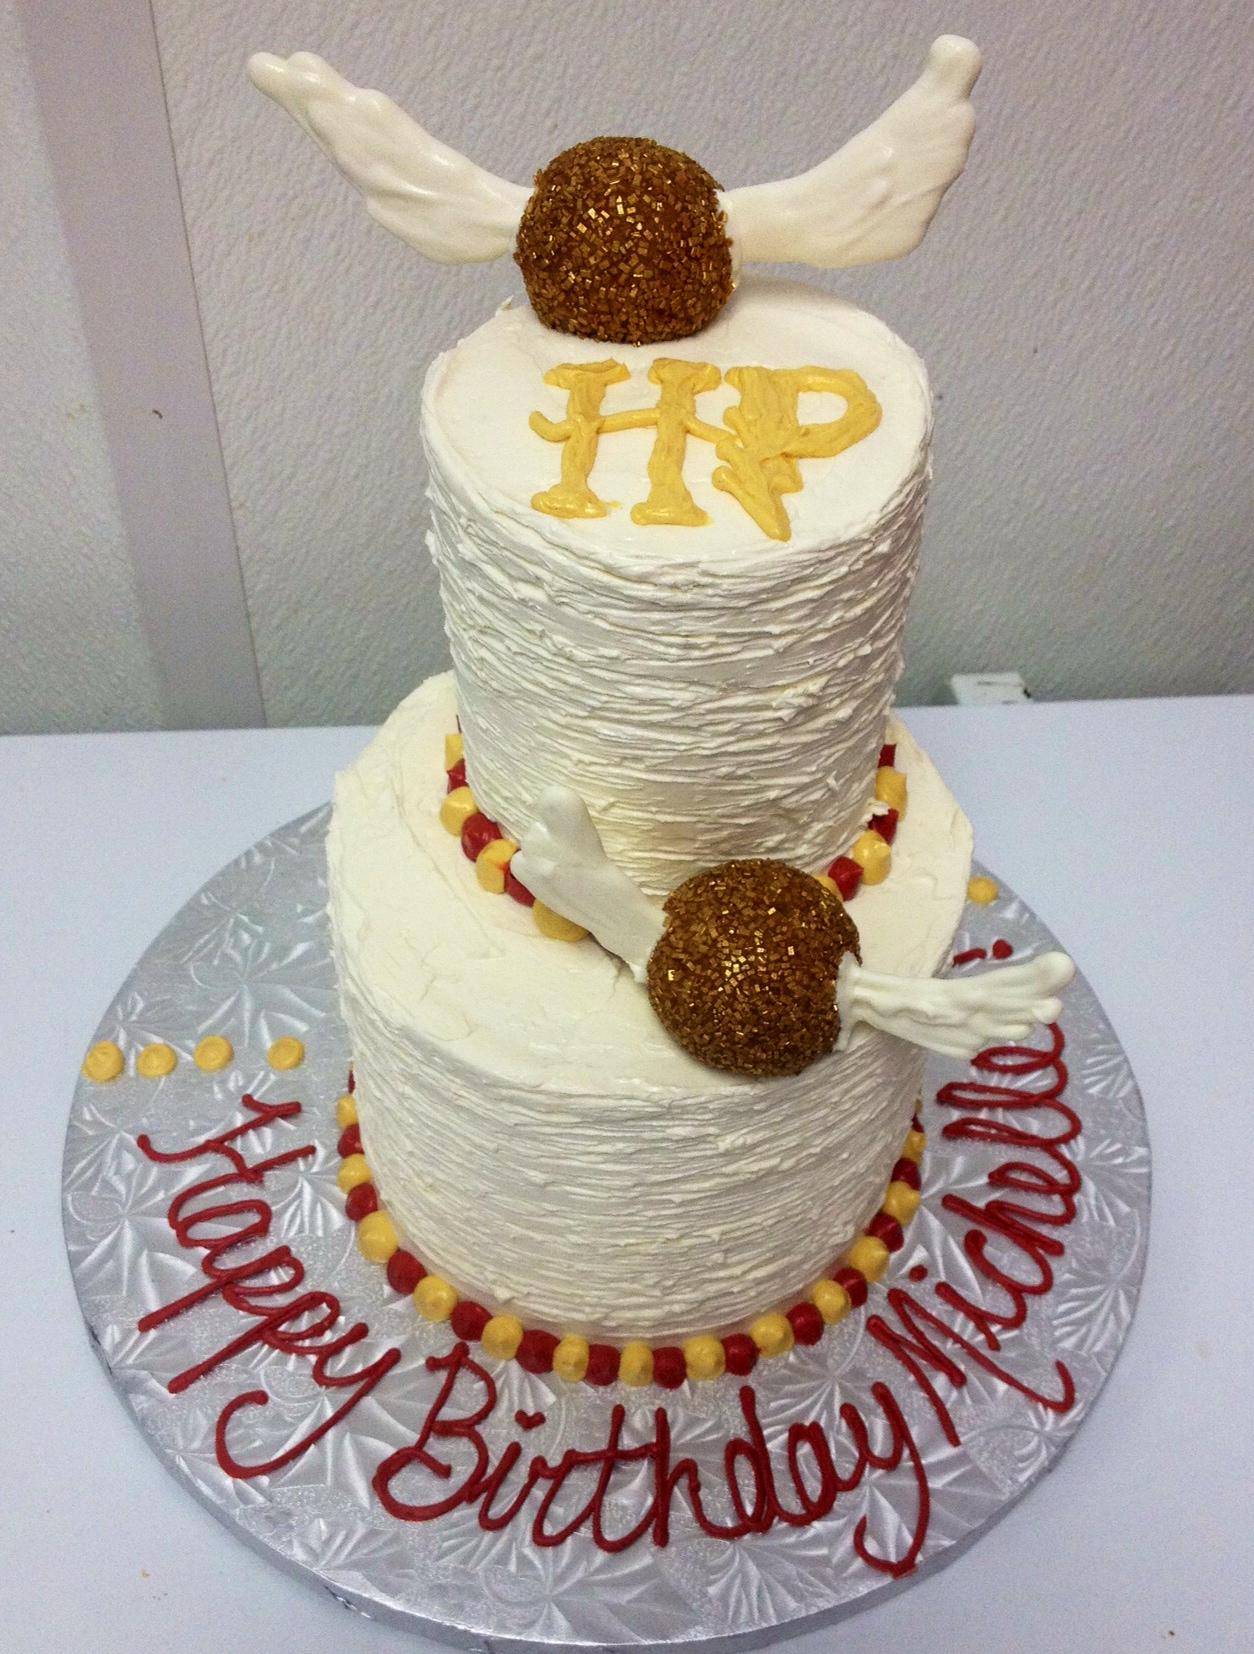 Harry Potter Two Tier Cake.JPG